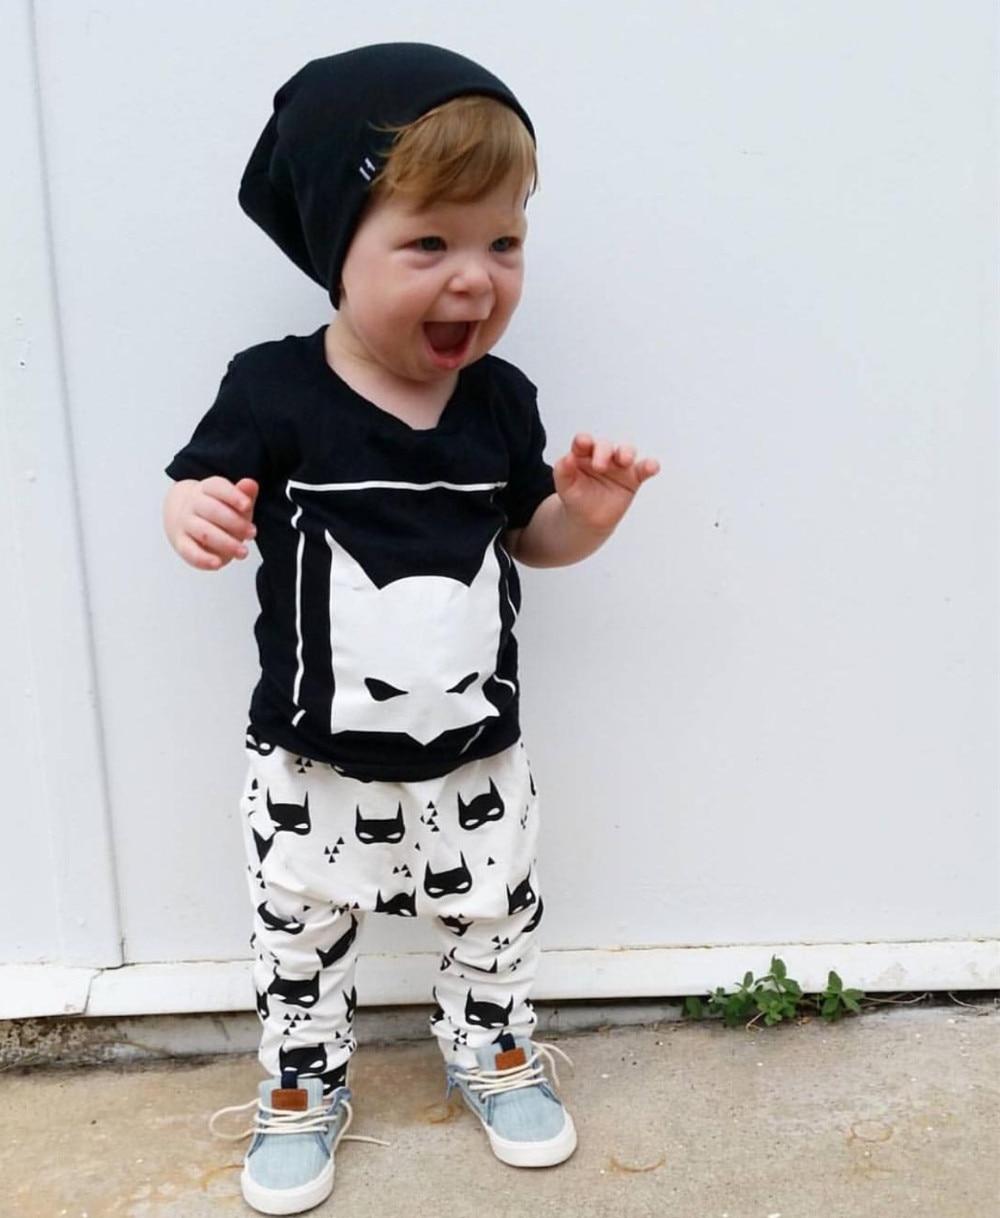 0ce6dddd1026 2019 New Fashion baby boy clothing set infant clothes unisex short-sleeved  cartoon T-shirt+pants 2pcs newborn baby girl clothes